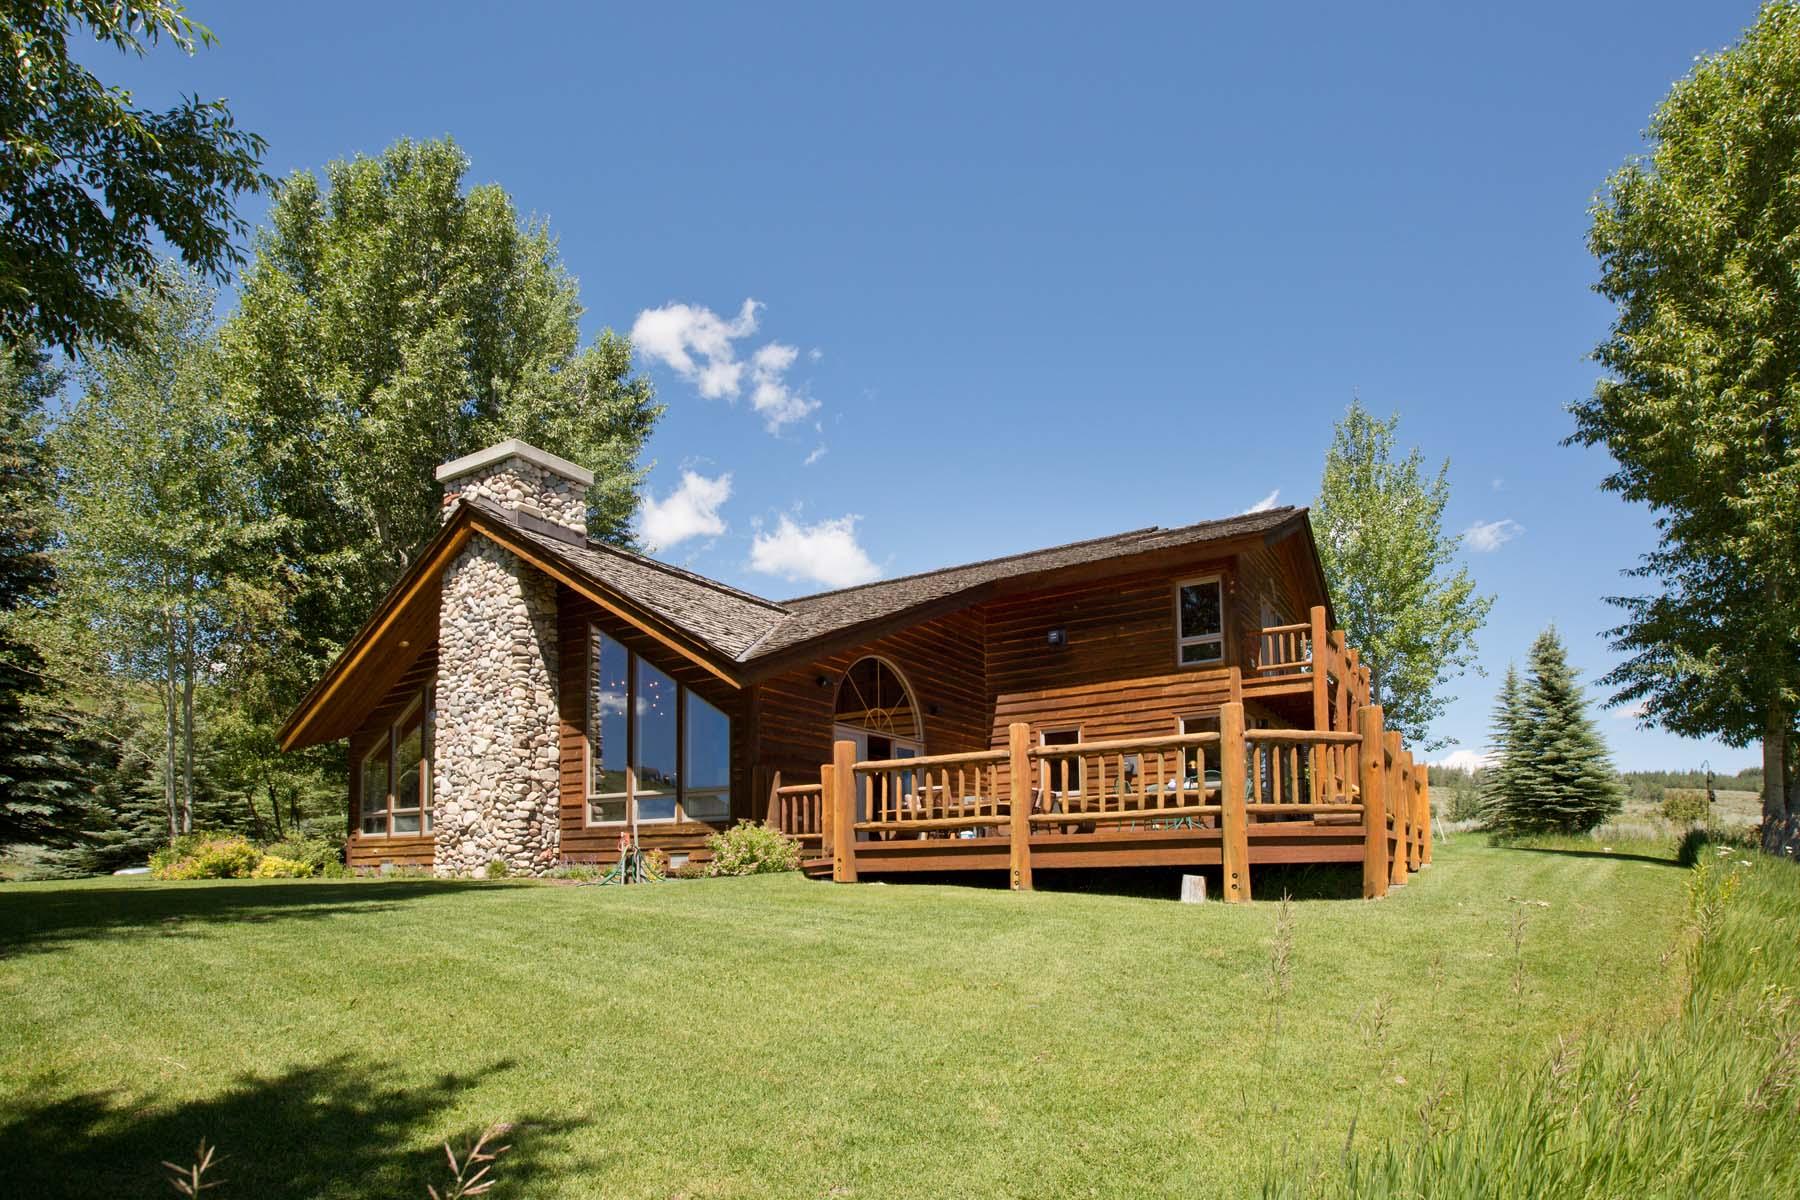 Moradia para Venda às Rarely Available Views and Setting 1400 Gannett Road Jackson, Wyoming, 83001 Estados Unidos